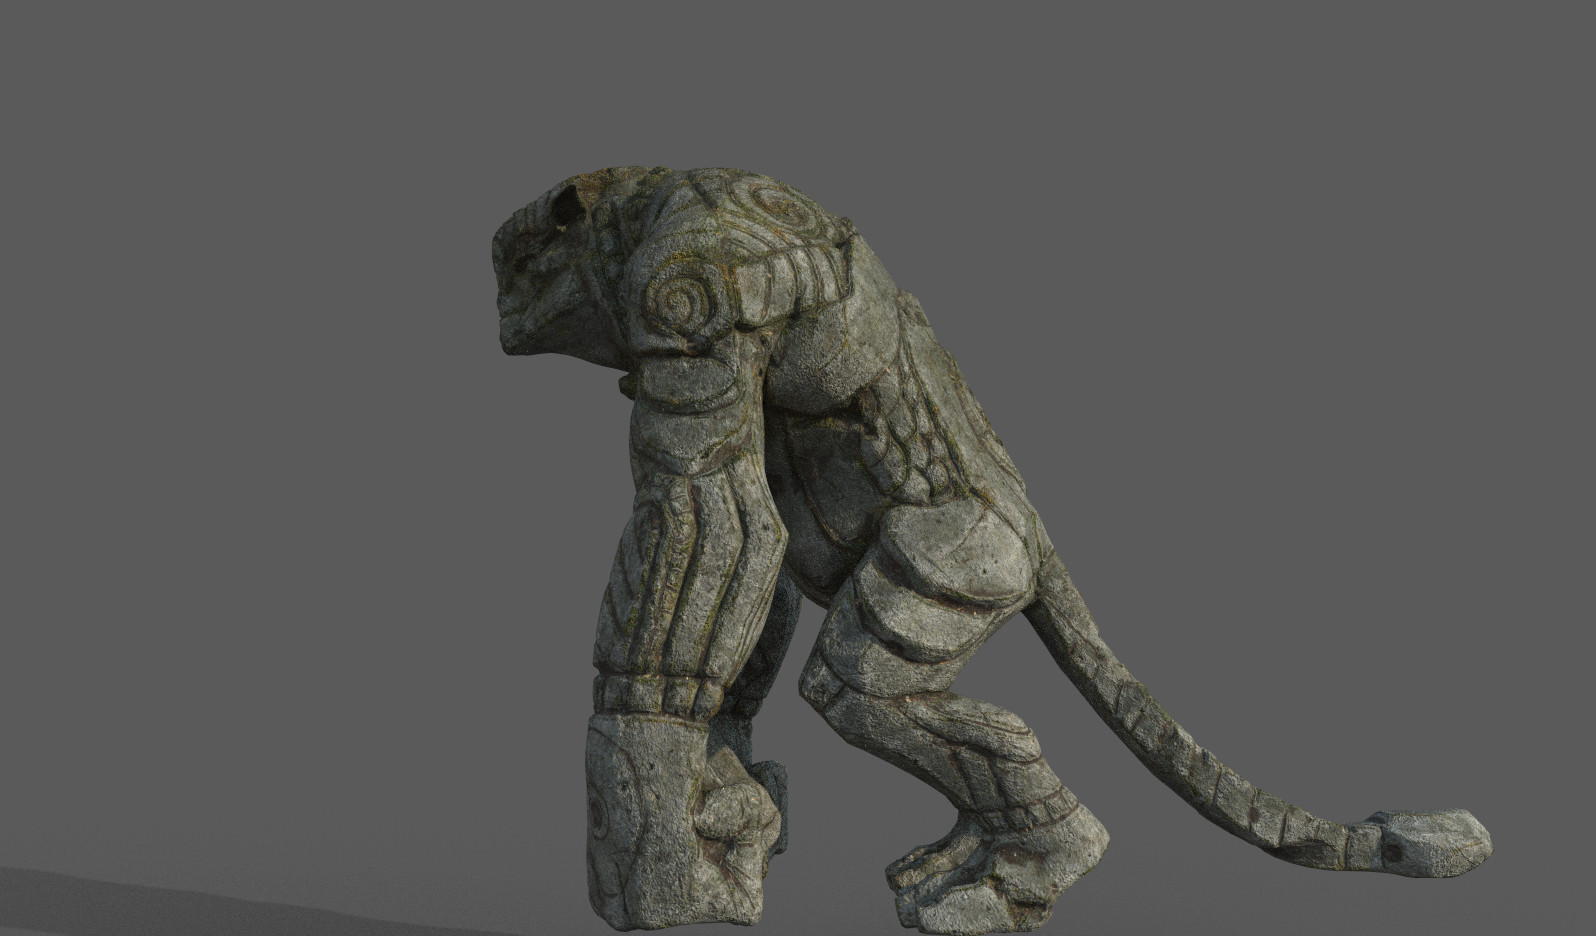 Darko mitev beast statue v1